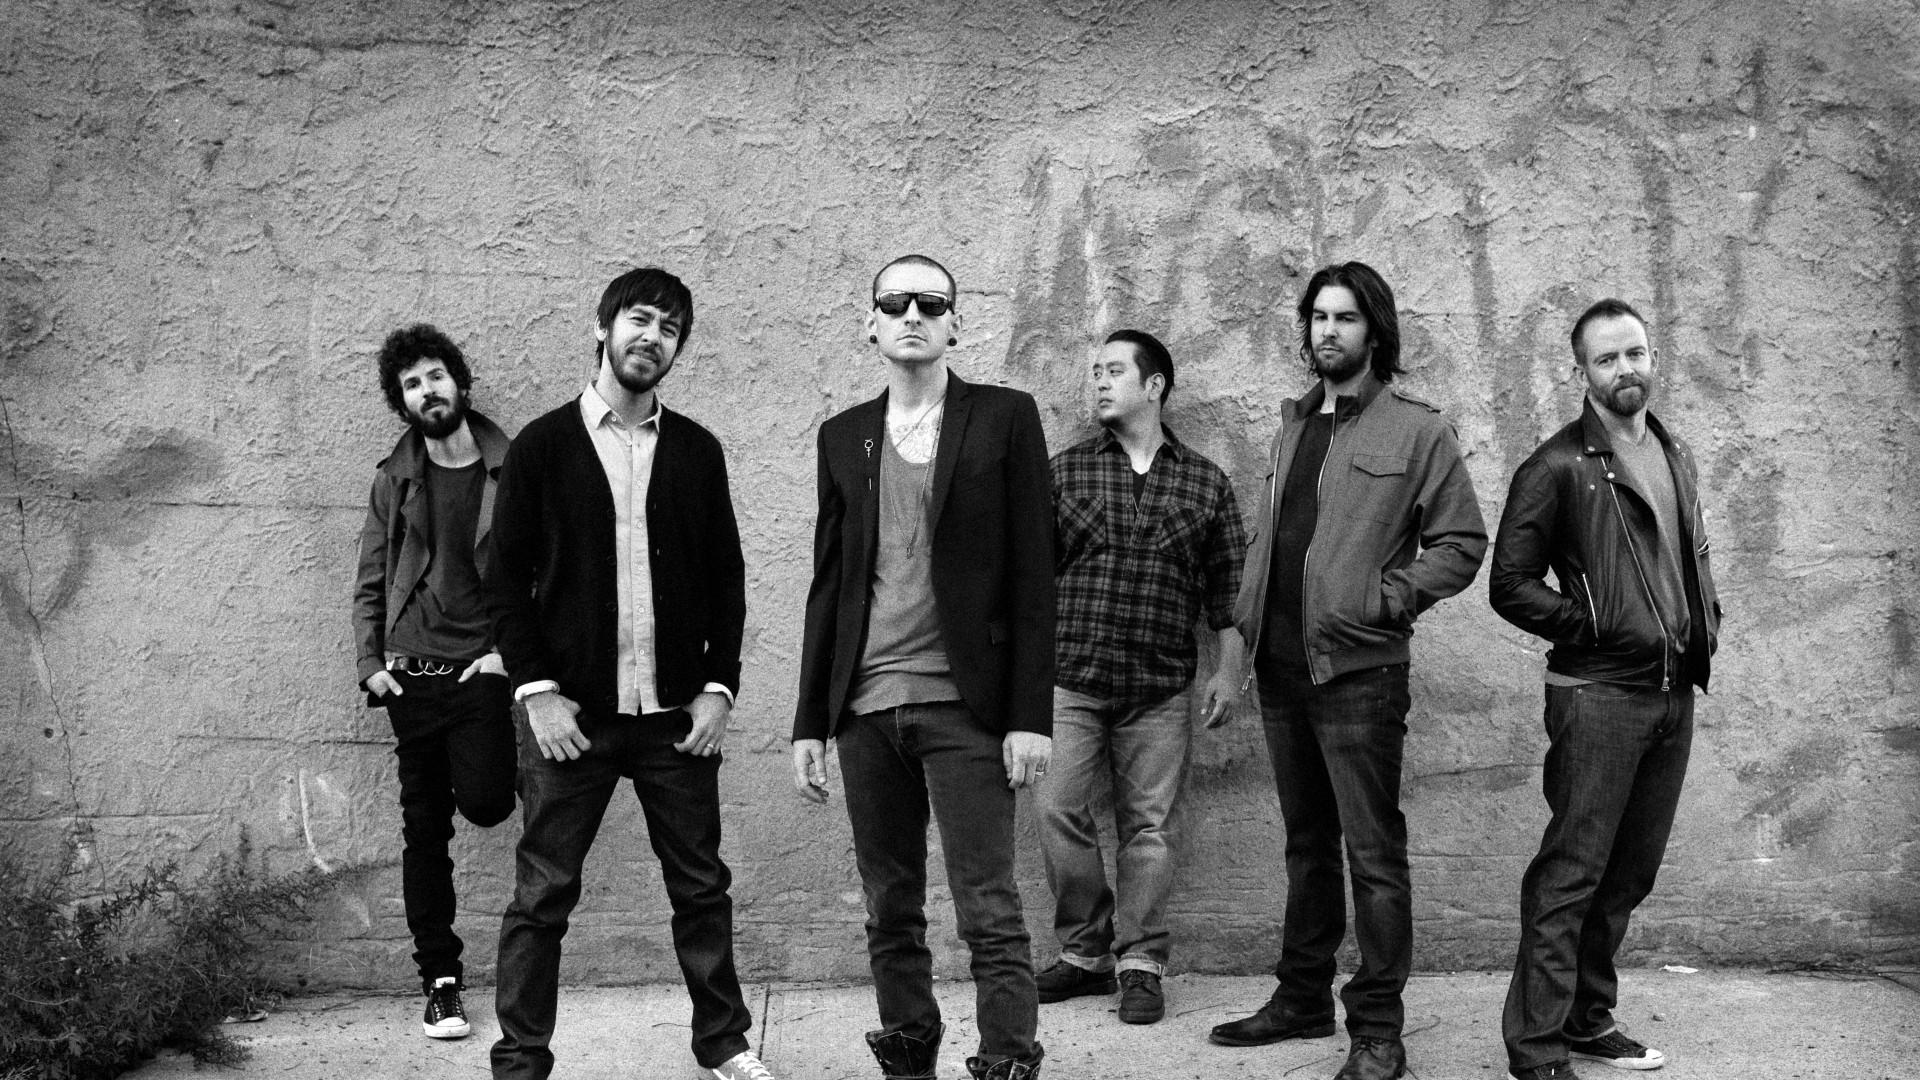 Linkin Park Wallpaper 1920x1080